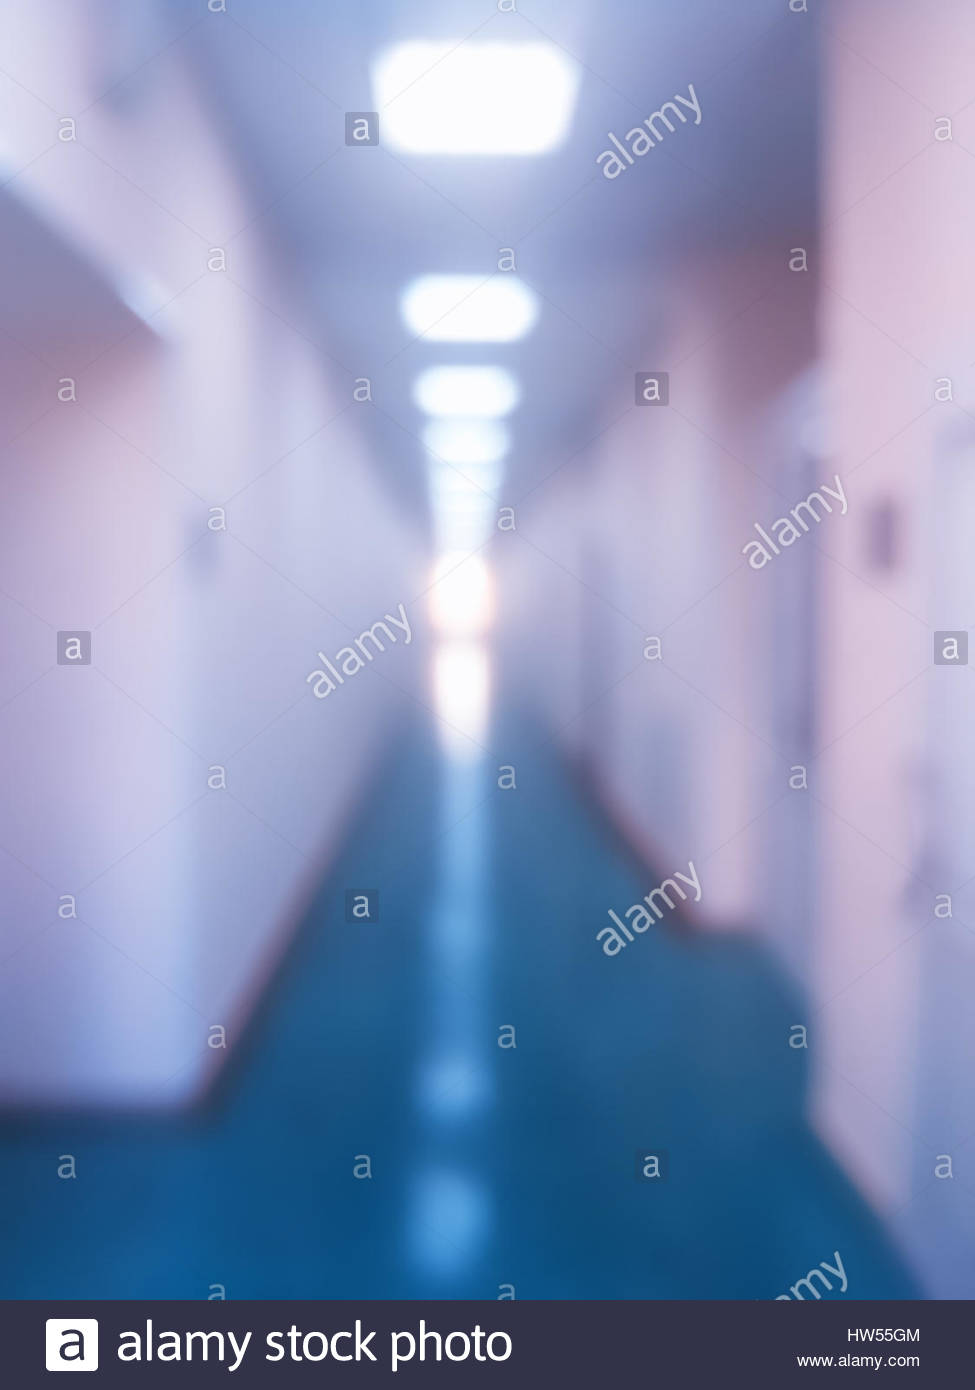 Vertical Office Corridor With Illumination Bokeh Background Hd Stock